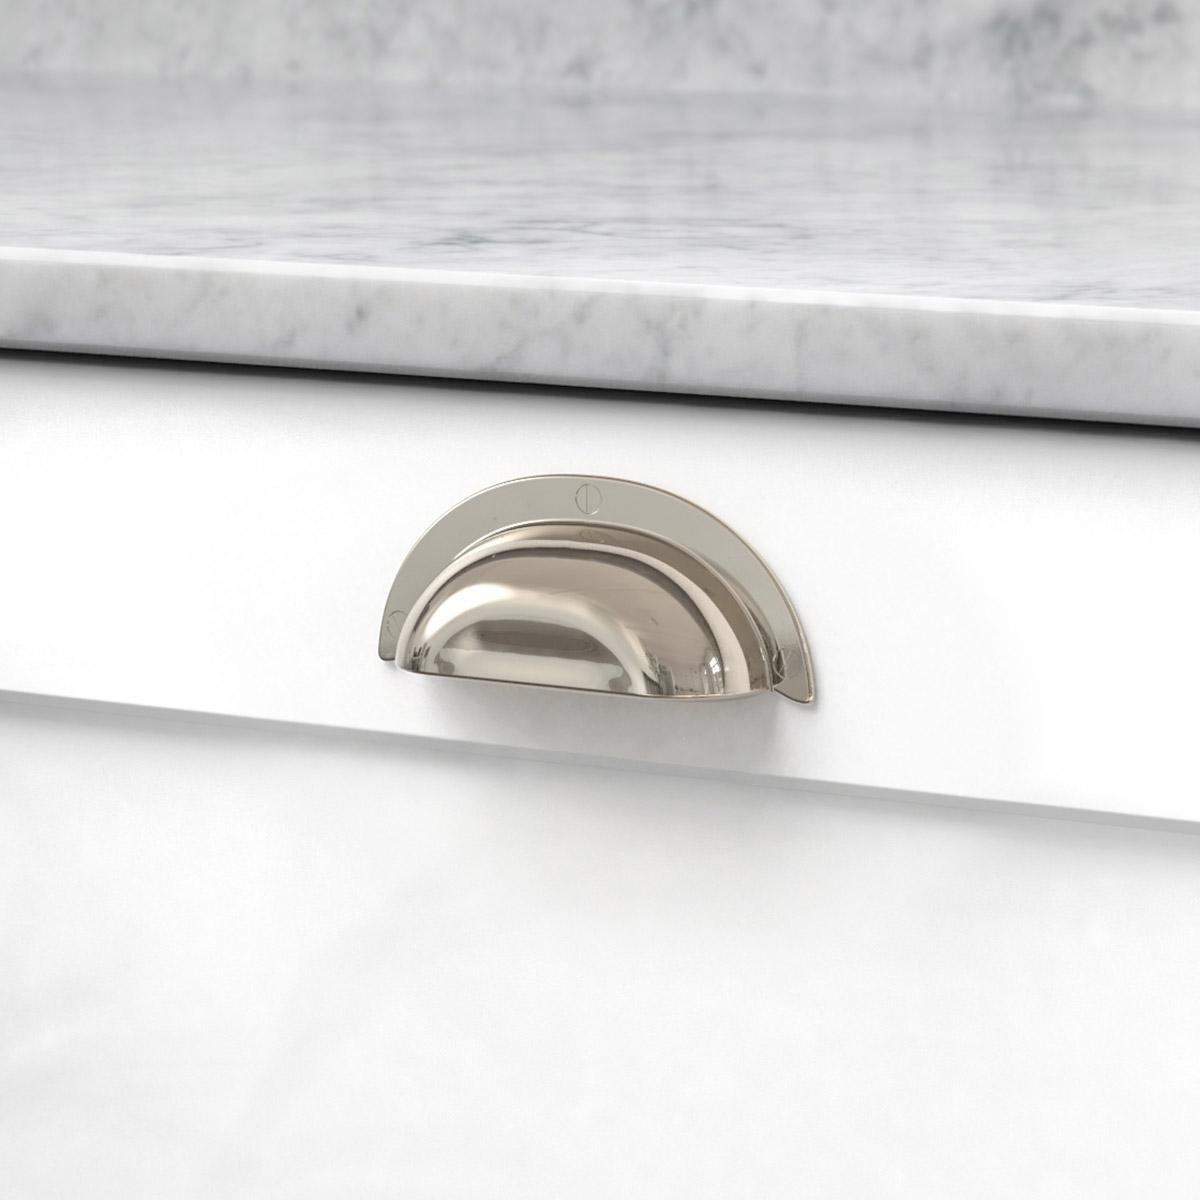 Skålhand 3922 fornicklad 39222 11 ncs s 0300 n marmor carrara